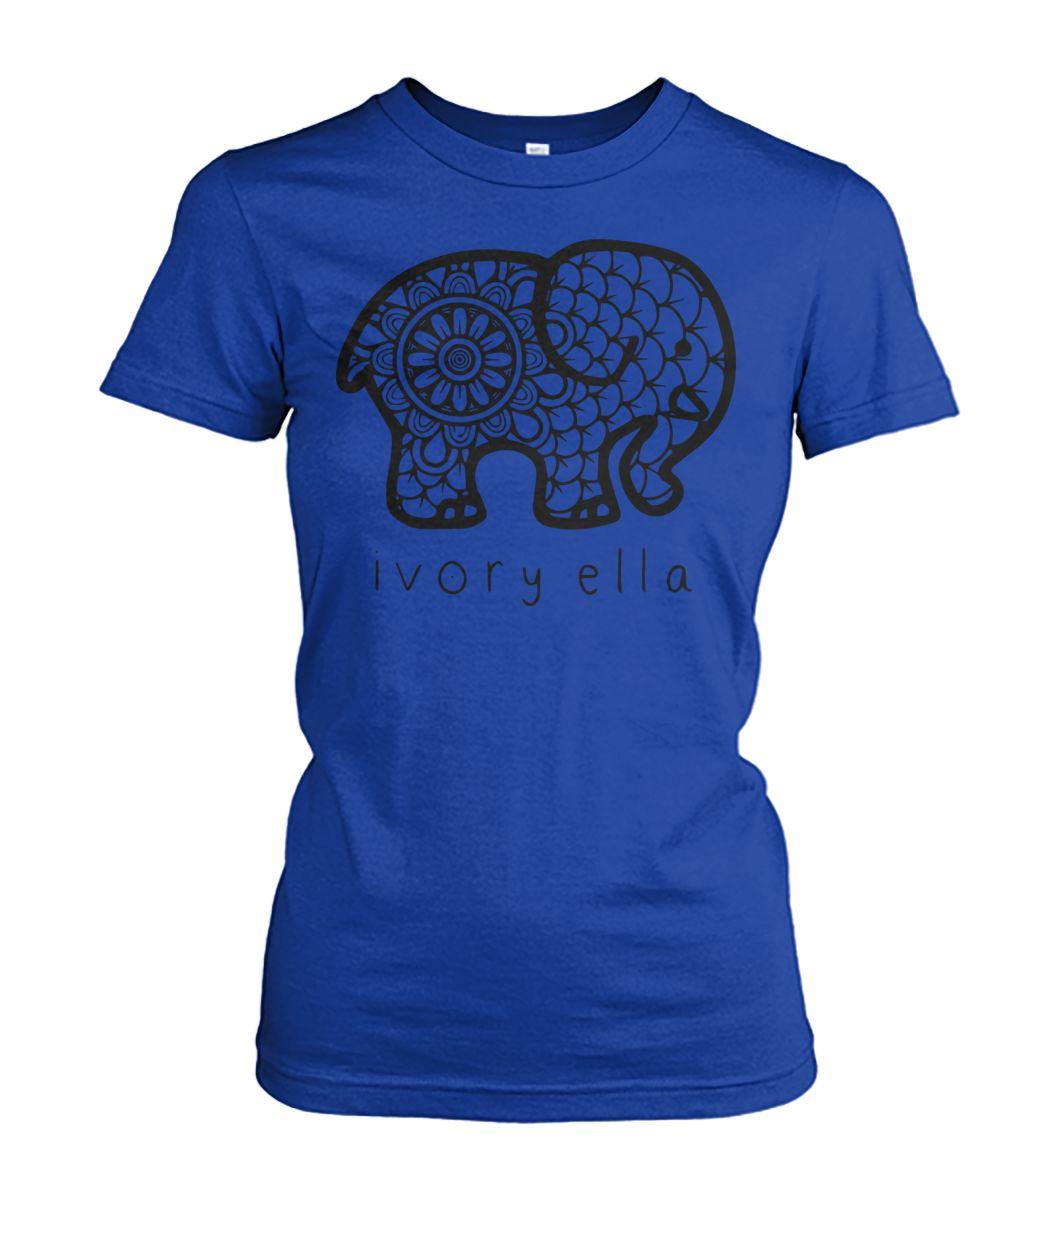 [Hot version] Ivory ella elephant shirt